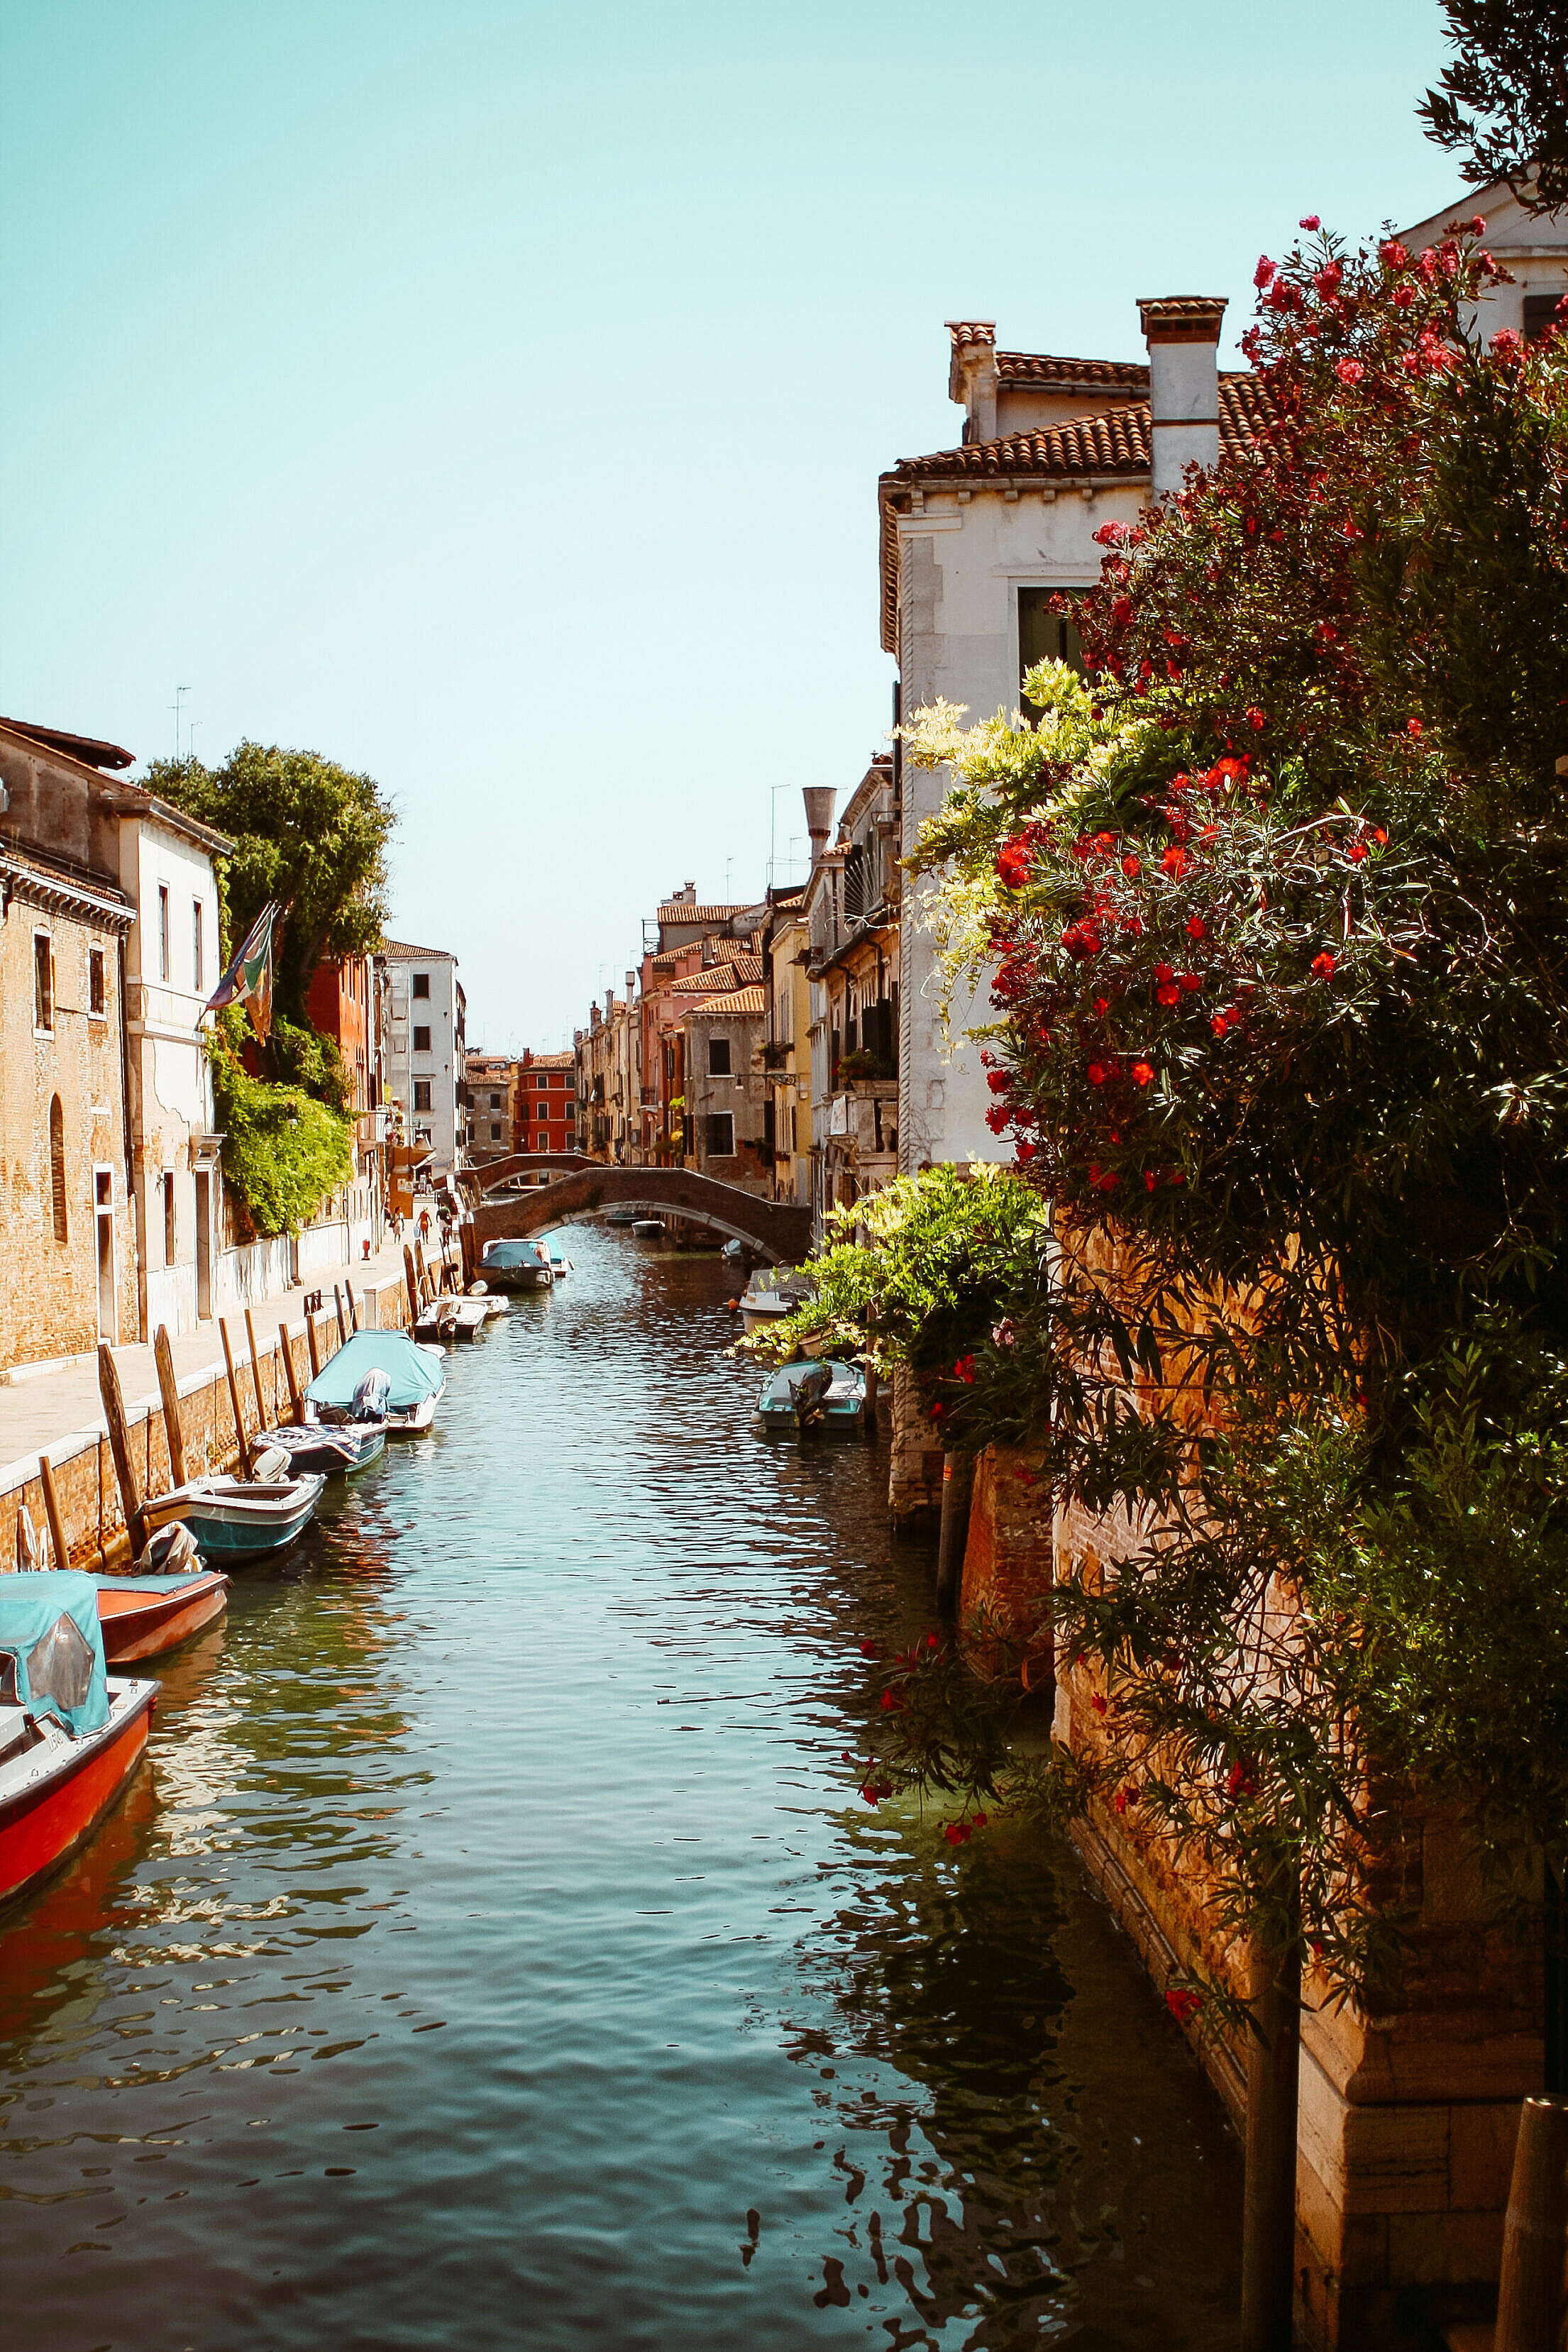 Venice Canals, Italy Free Stock Photo